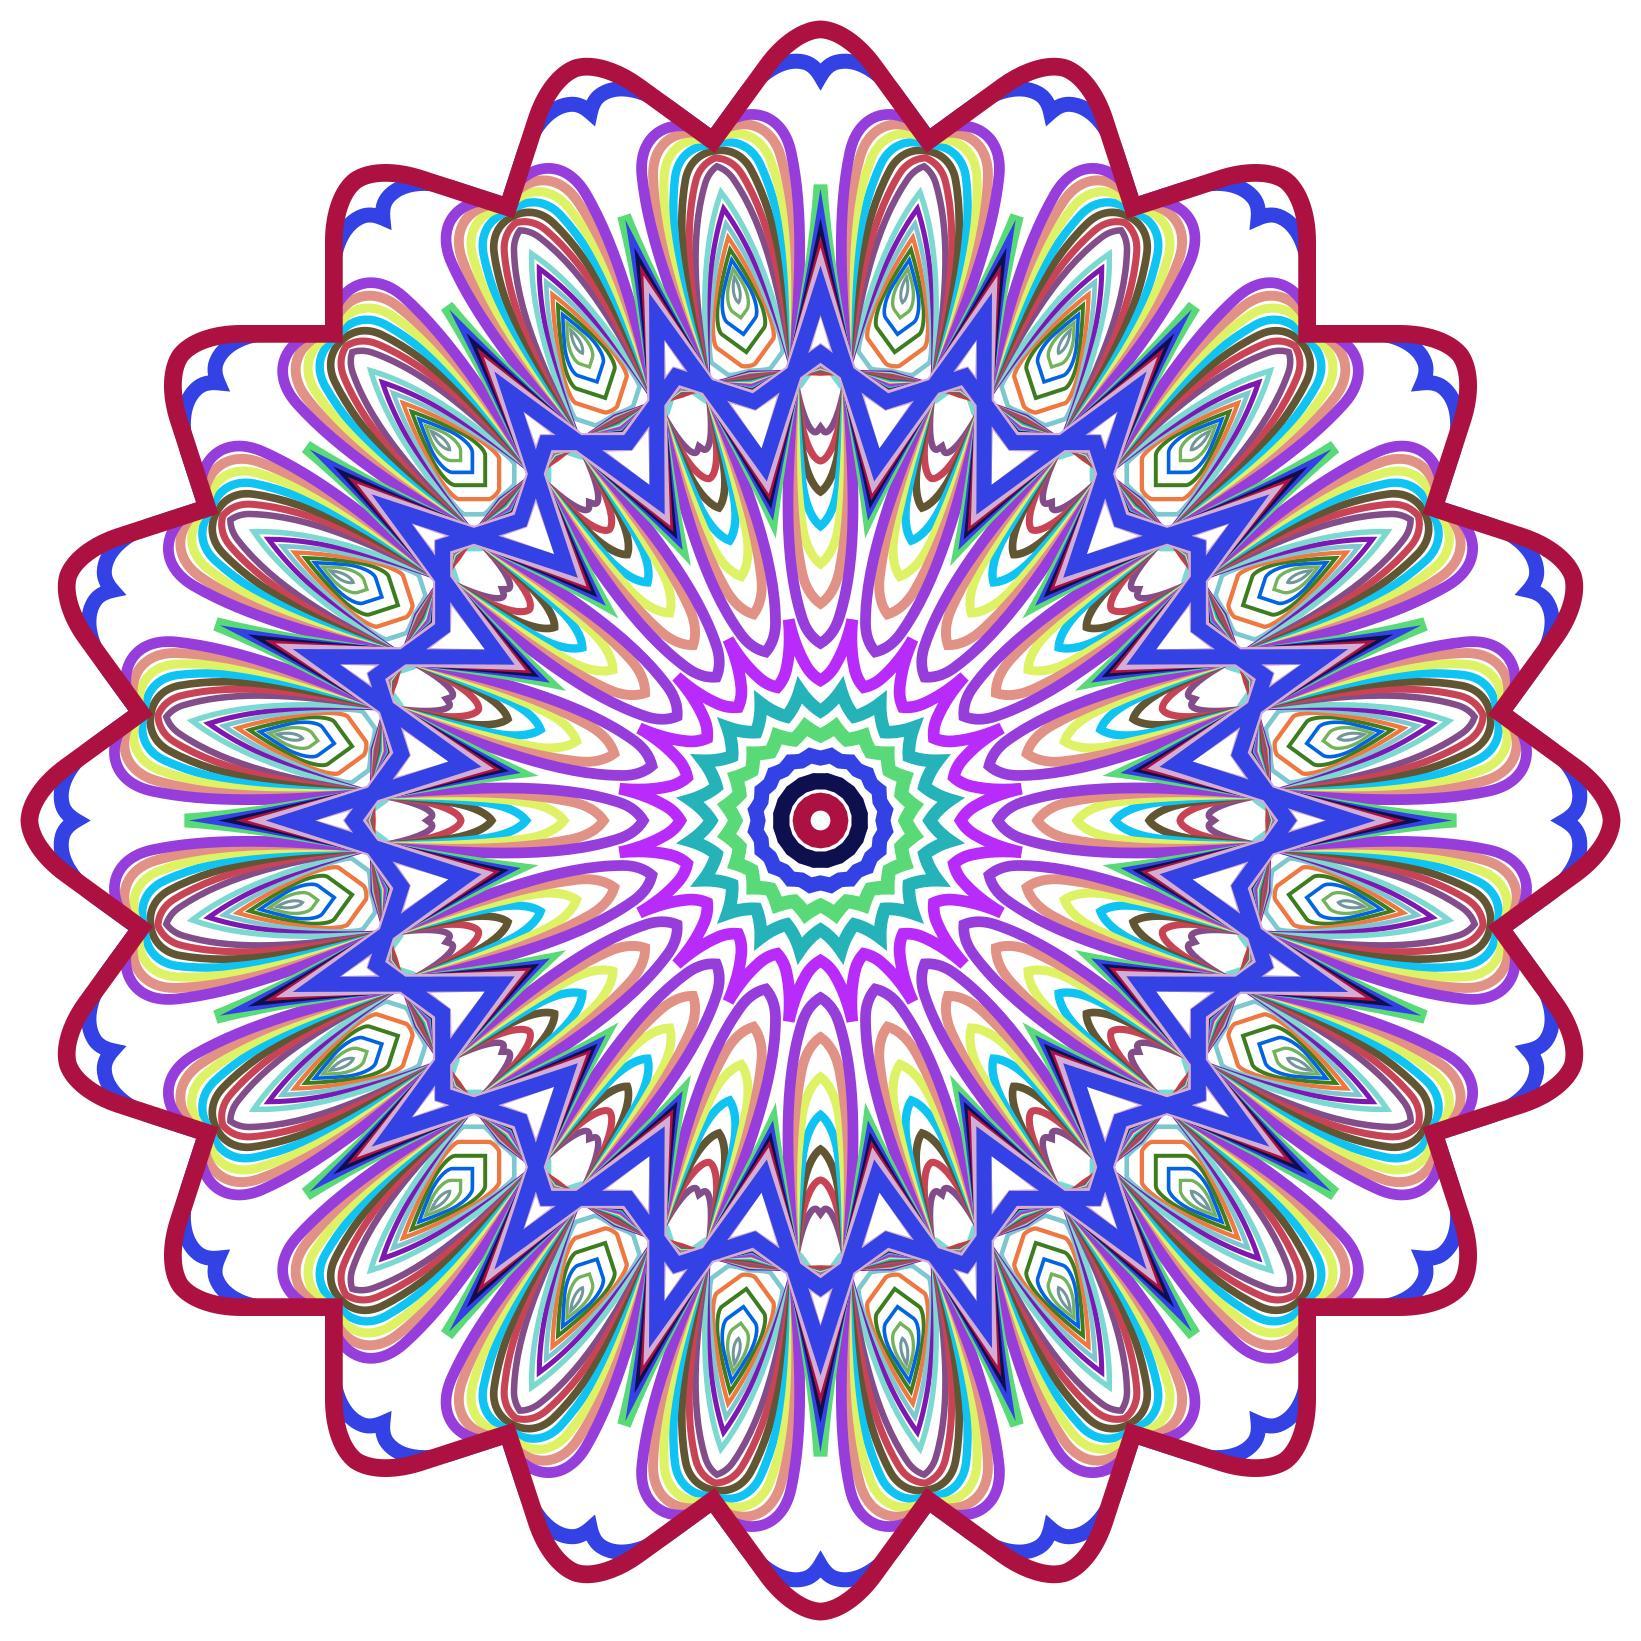 1641x1641 Prismatic Mandala Line Art Design 4 No Background Clipart